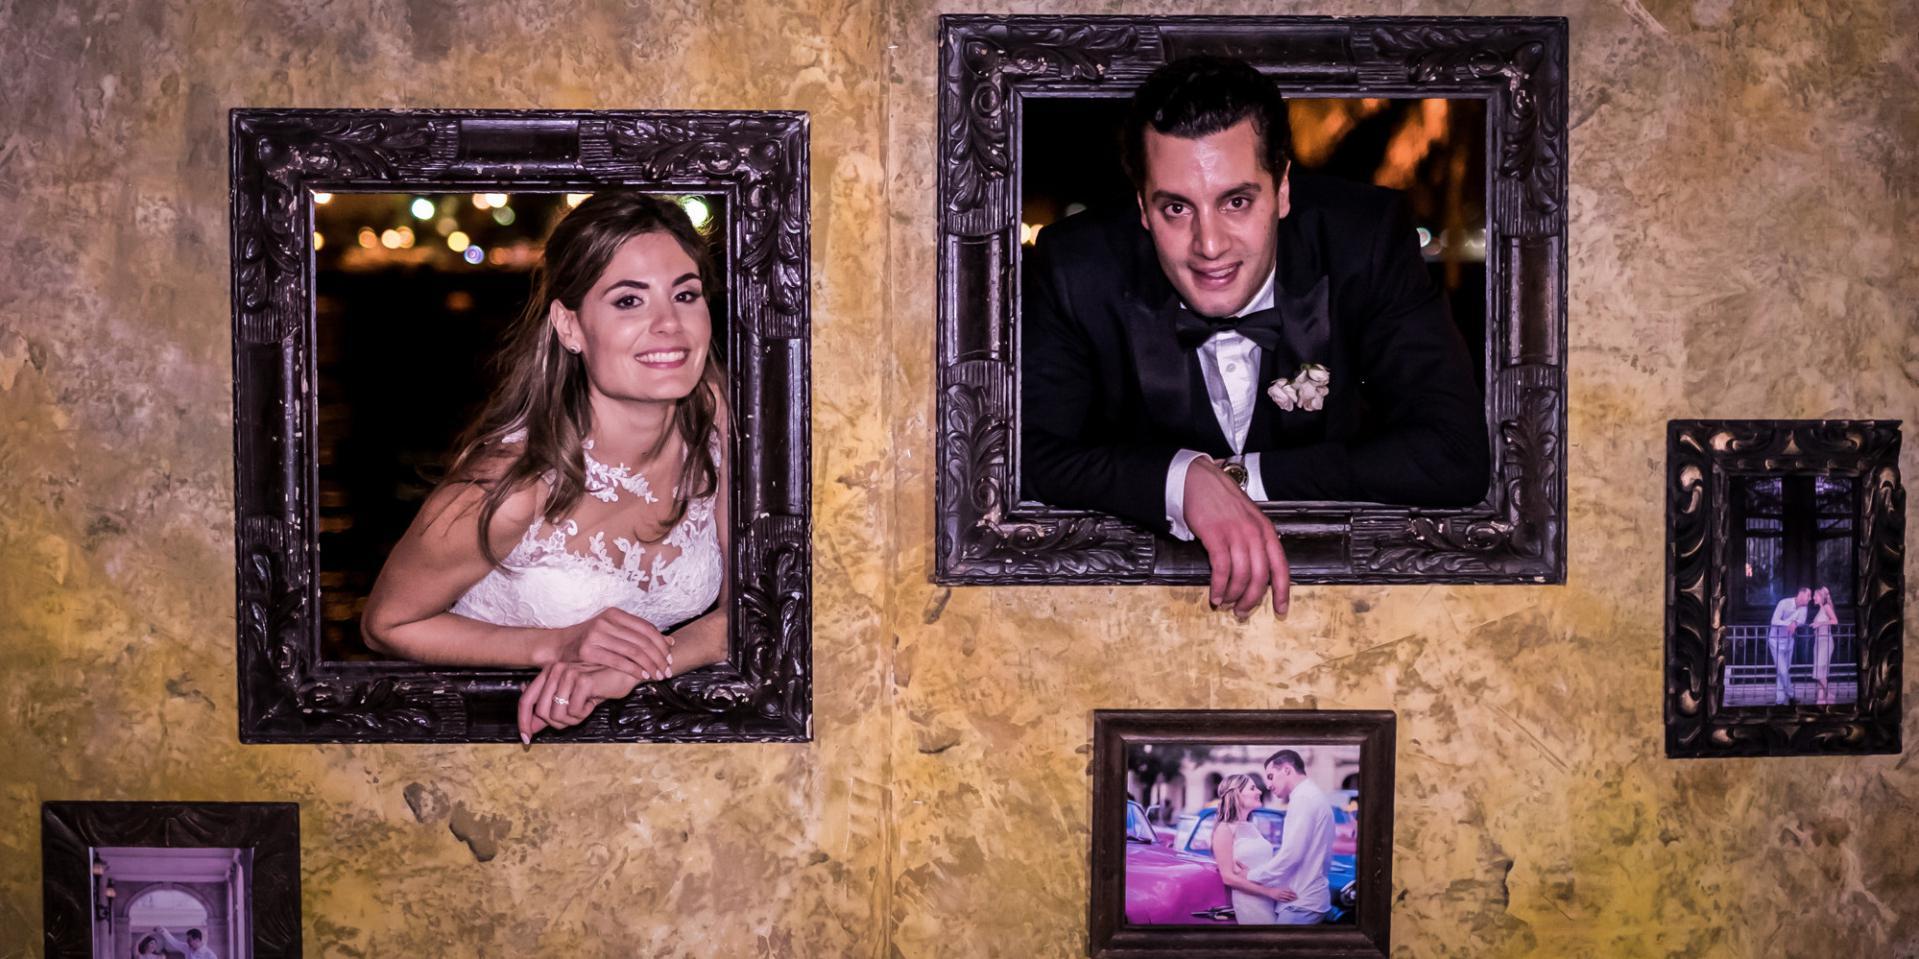 bodas-sin-clasificar-sin-tema-cuba-27841.jpg